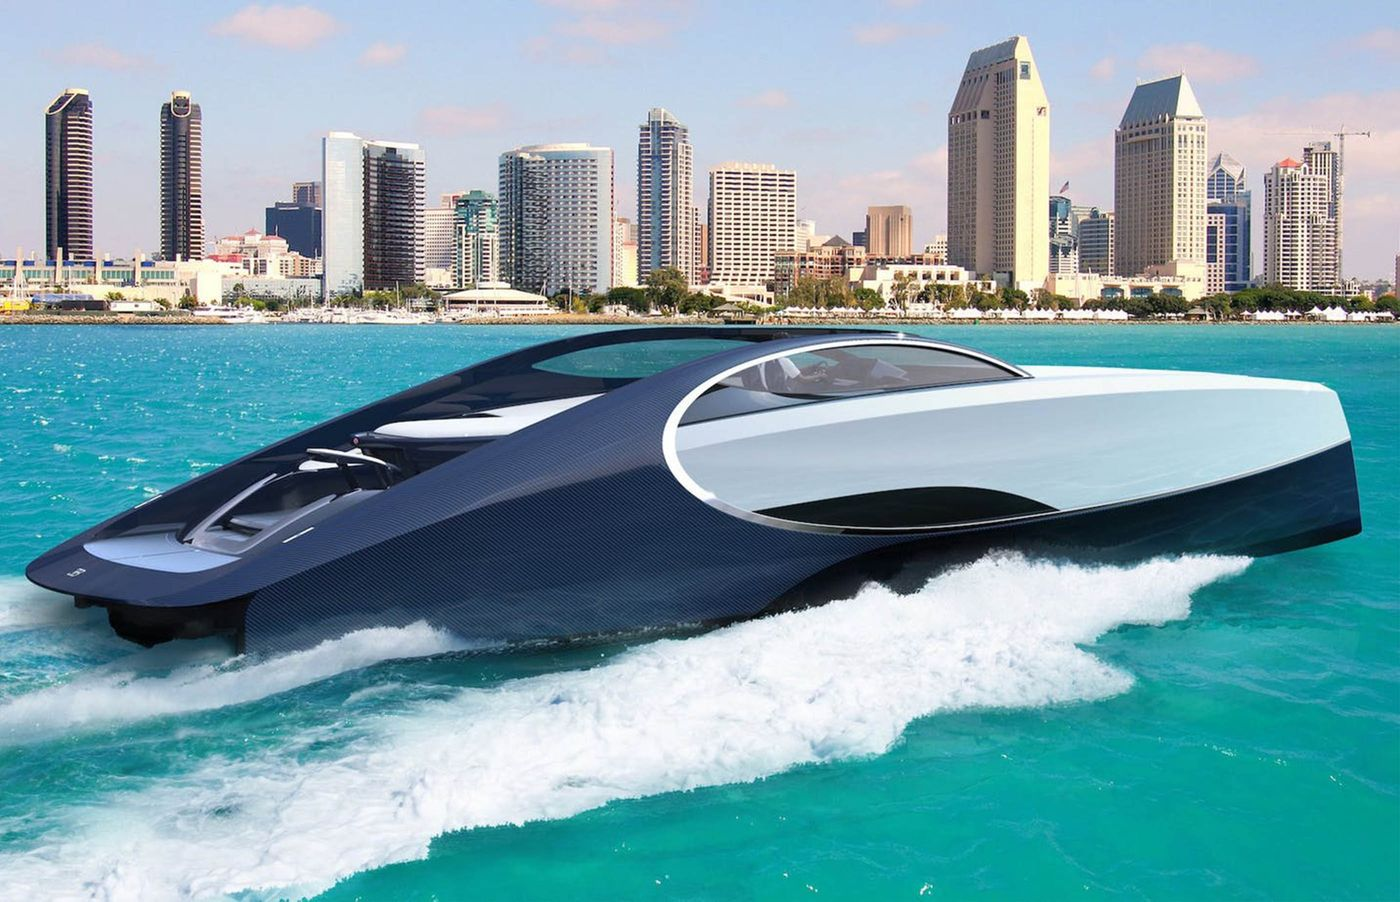 Bugatti Limited Edition Speed Boat